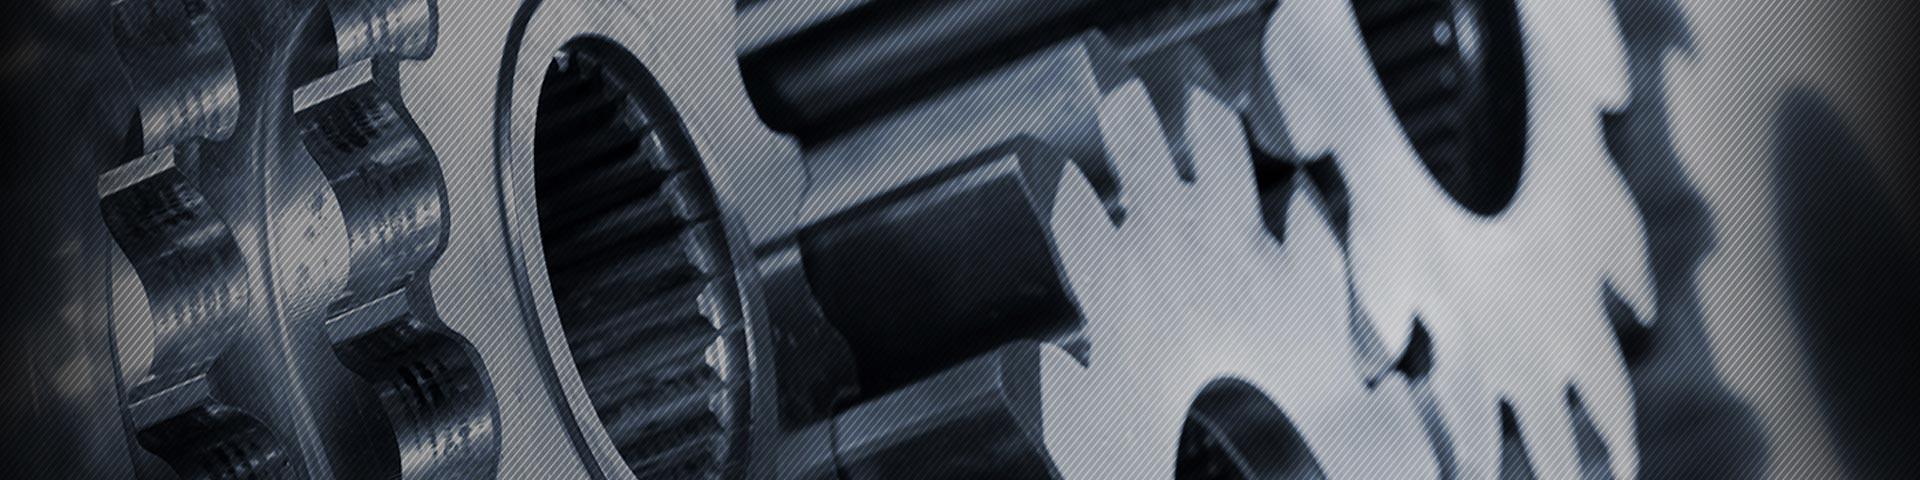 Aluminium Die Casting Software ERP Software Roadmap ERP